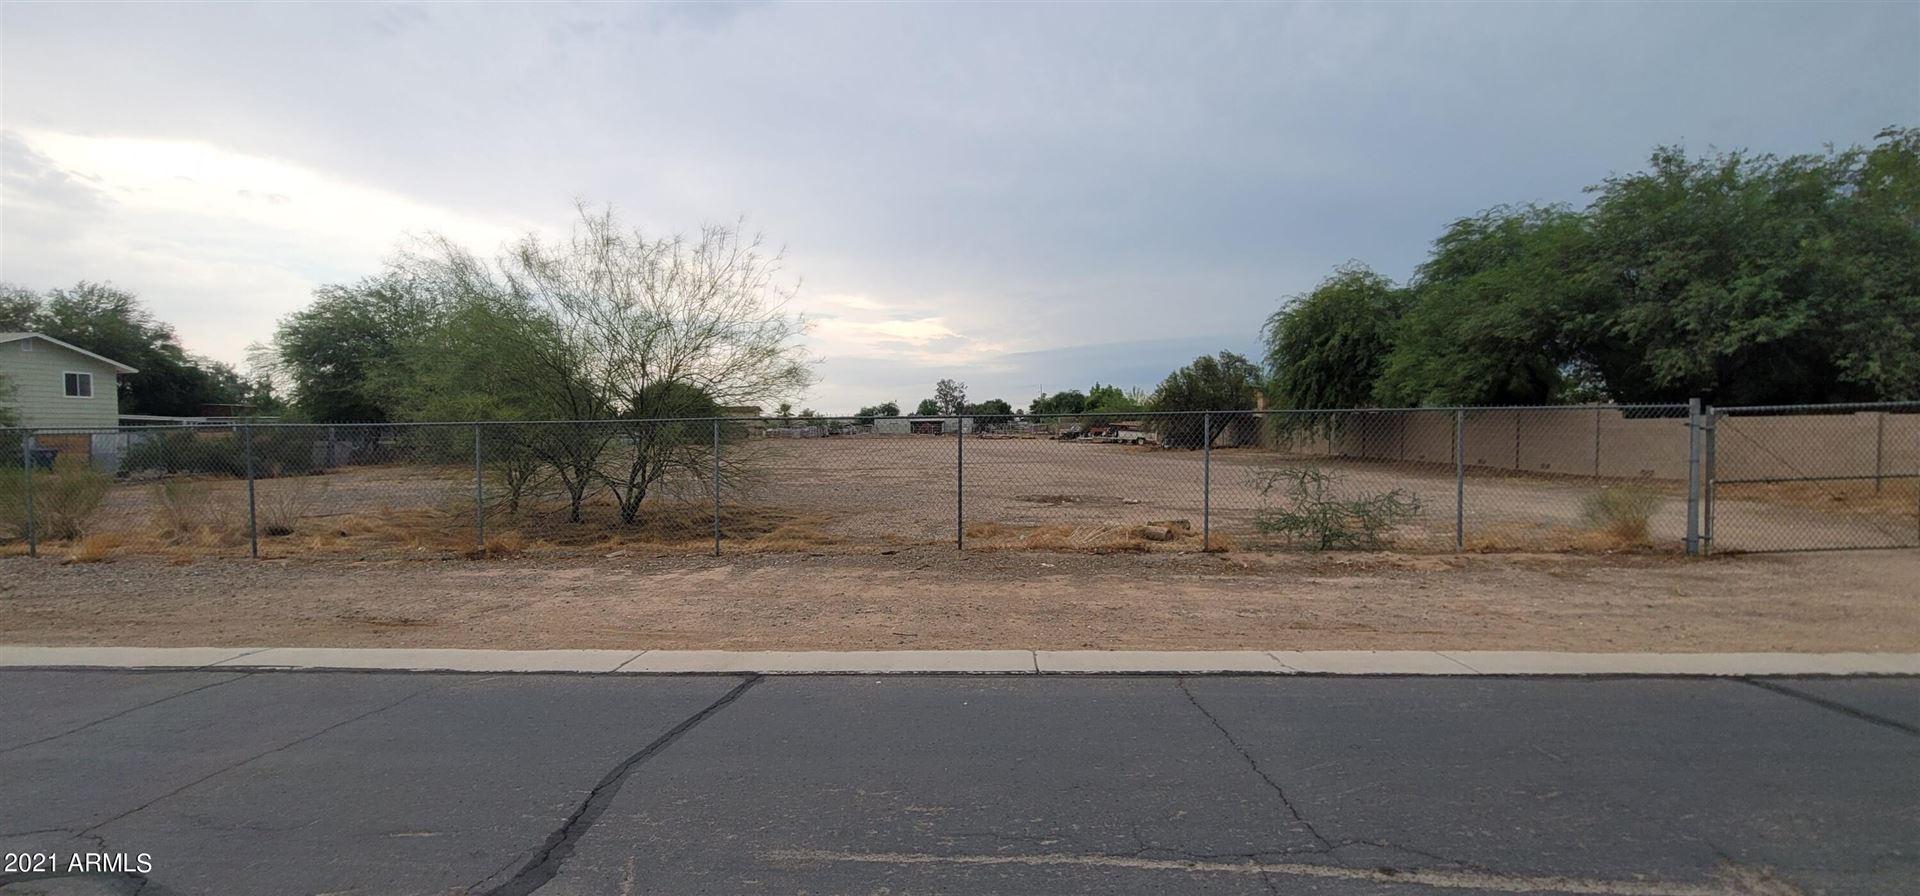 Photo of 12902 W SAHUARO Drive, El Mirage, AZ 85335 (MLS # 6268828)